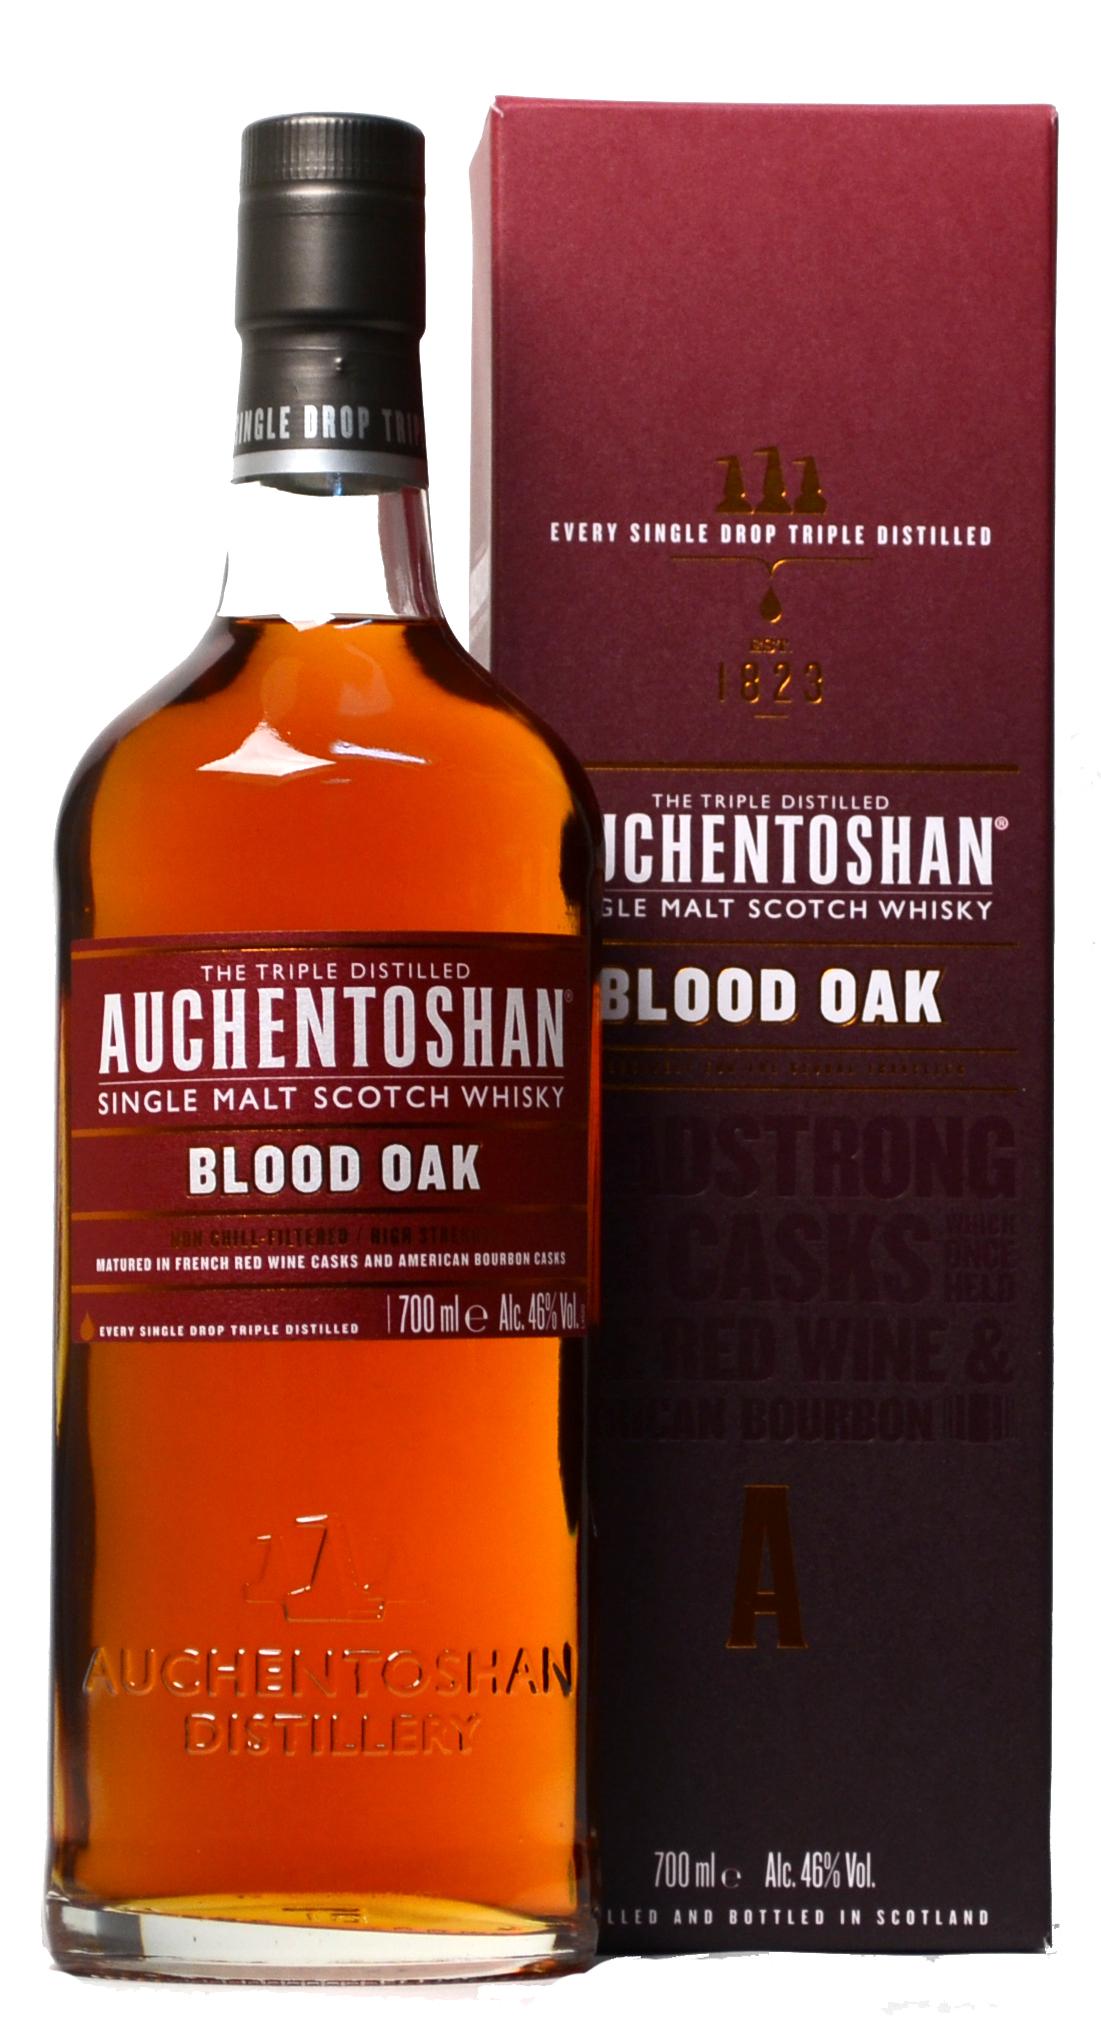 Image result for auchentoshan blood oak